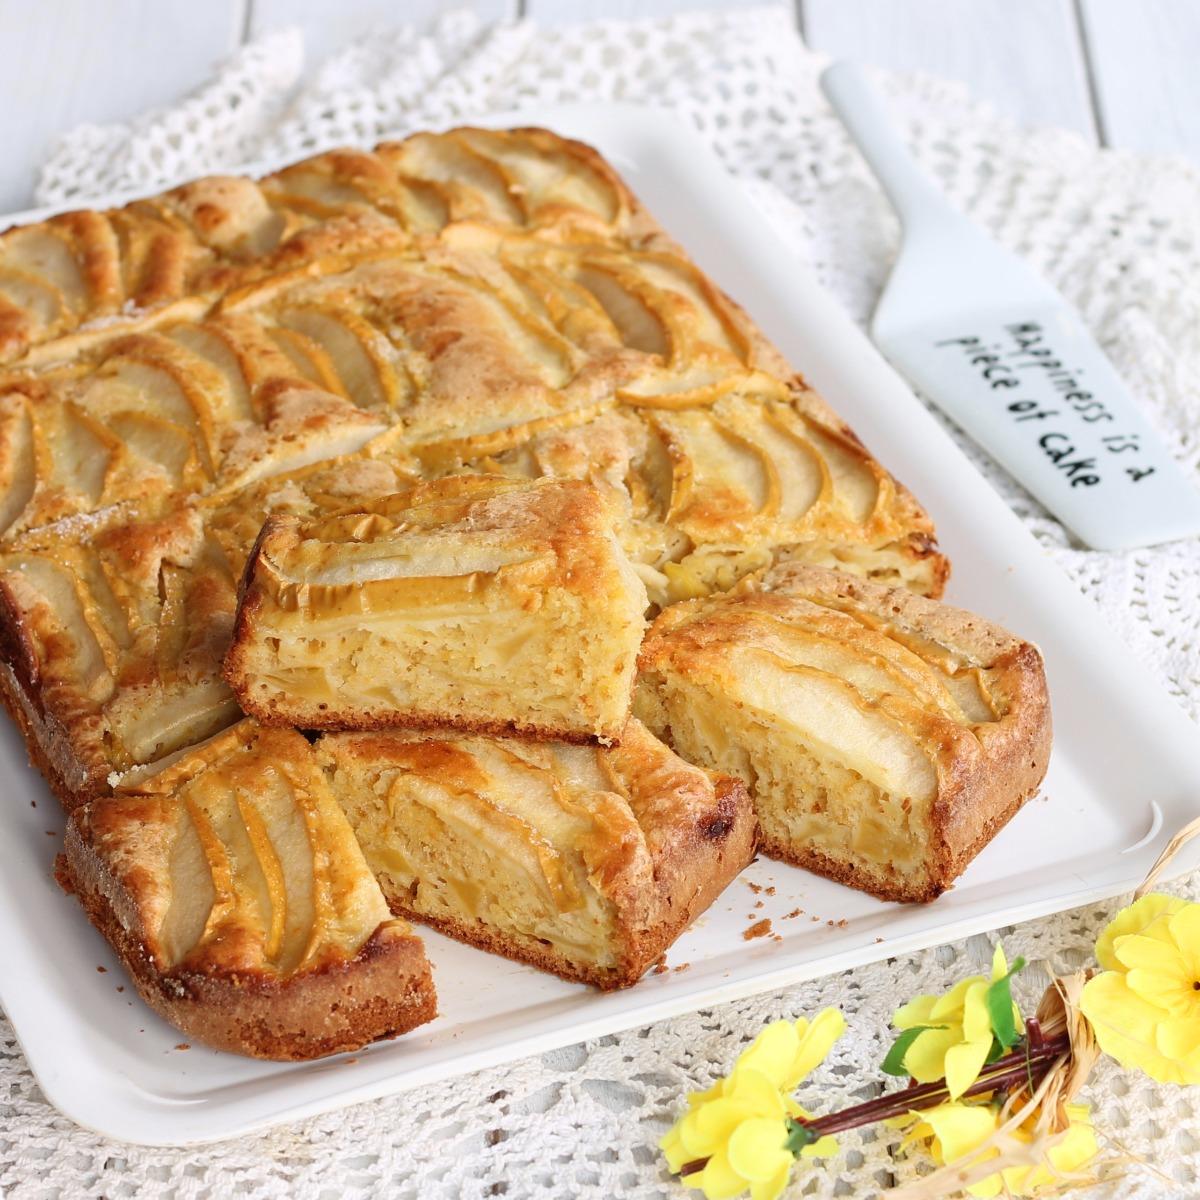 TORTA MELE LIMONE MANDORLE ricetta torta di mele senza latticini